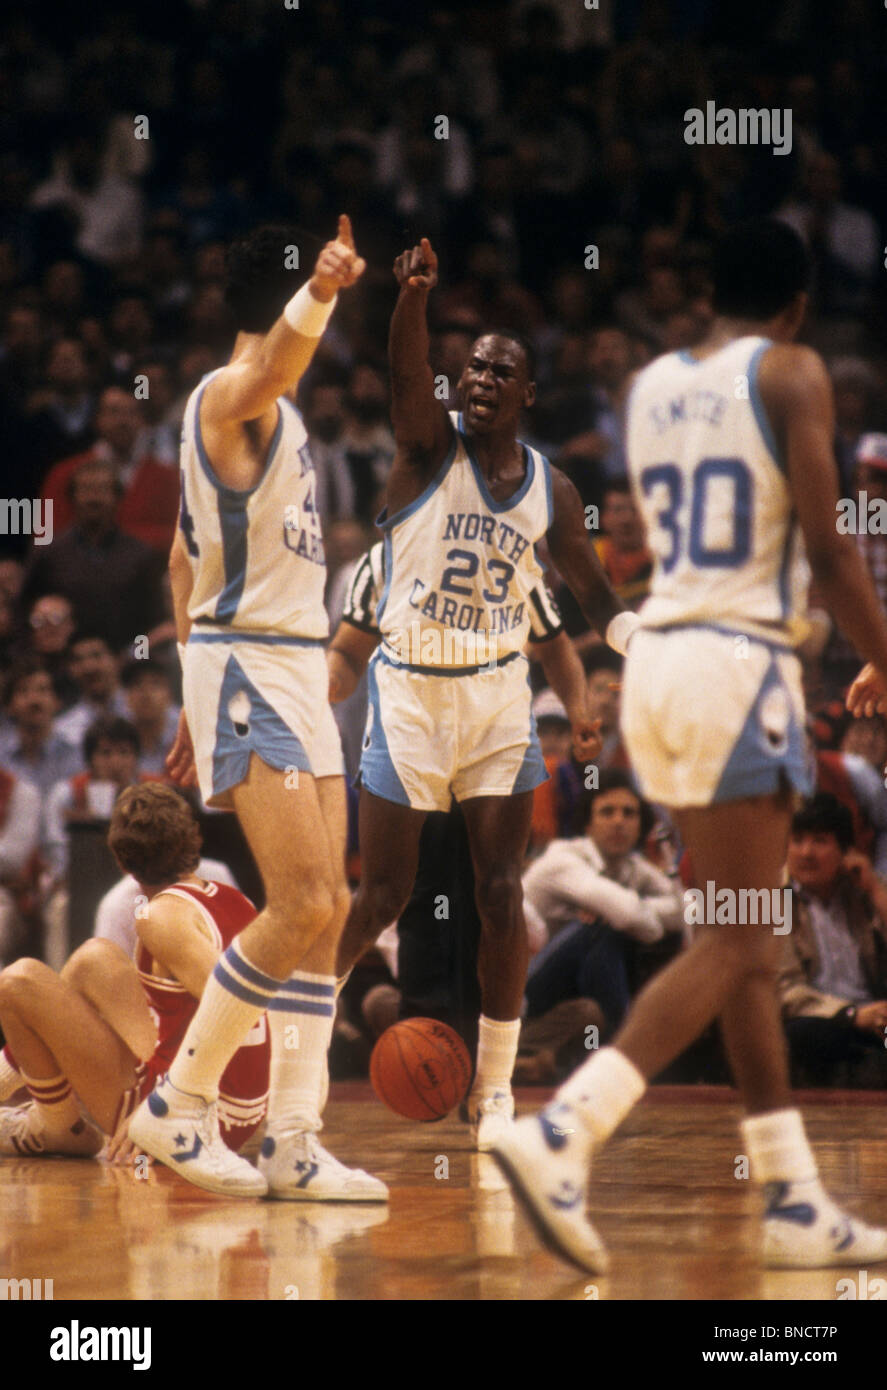 A photo of michael jordan as a college basketball player Michael Jordan Success Inspirational Motivational